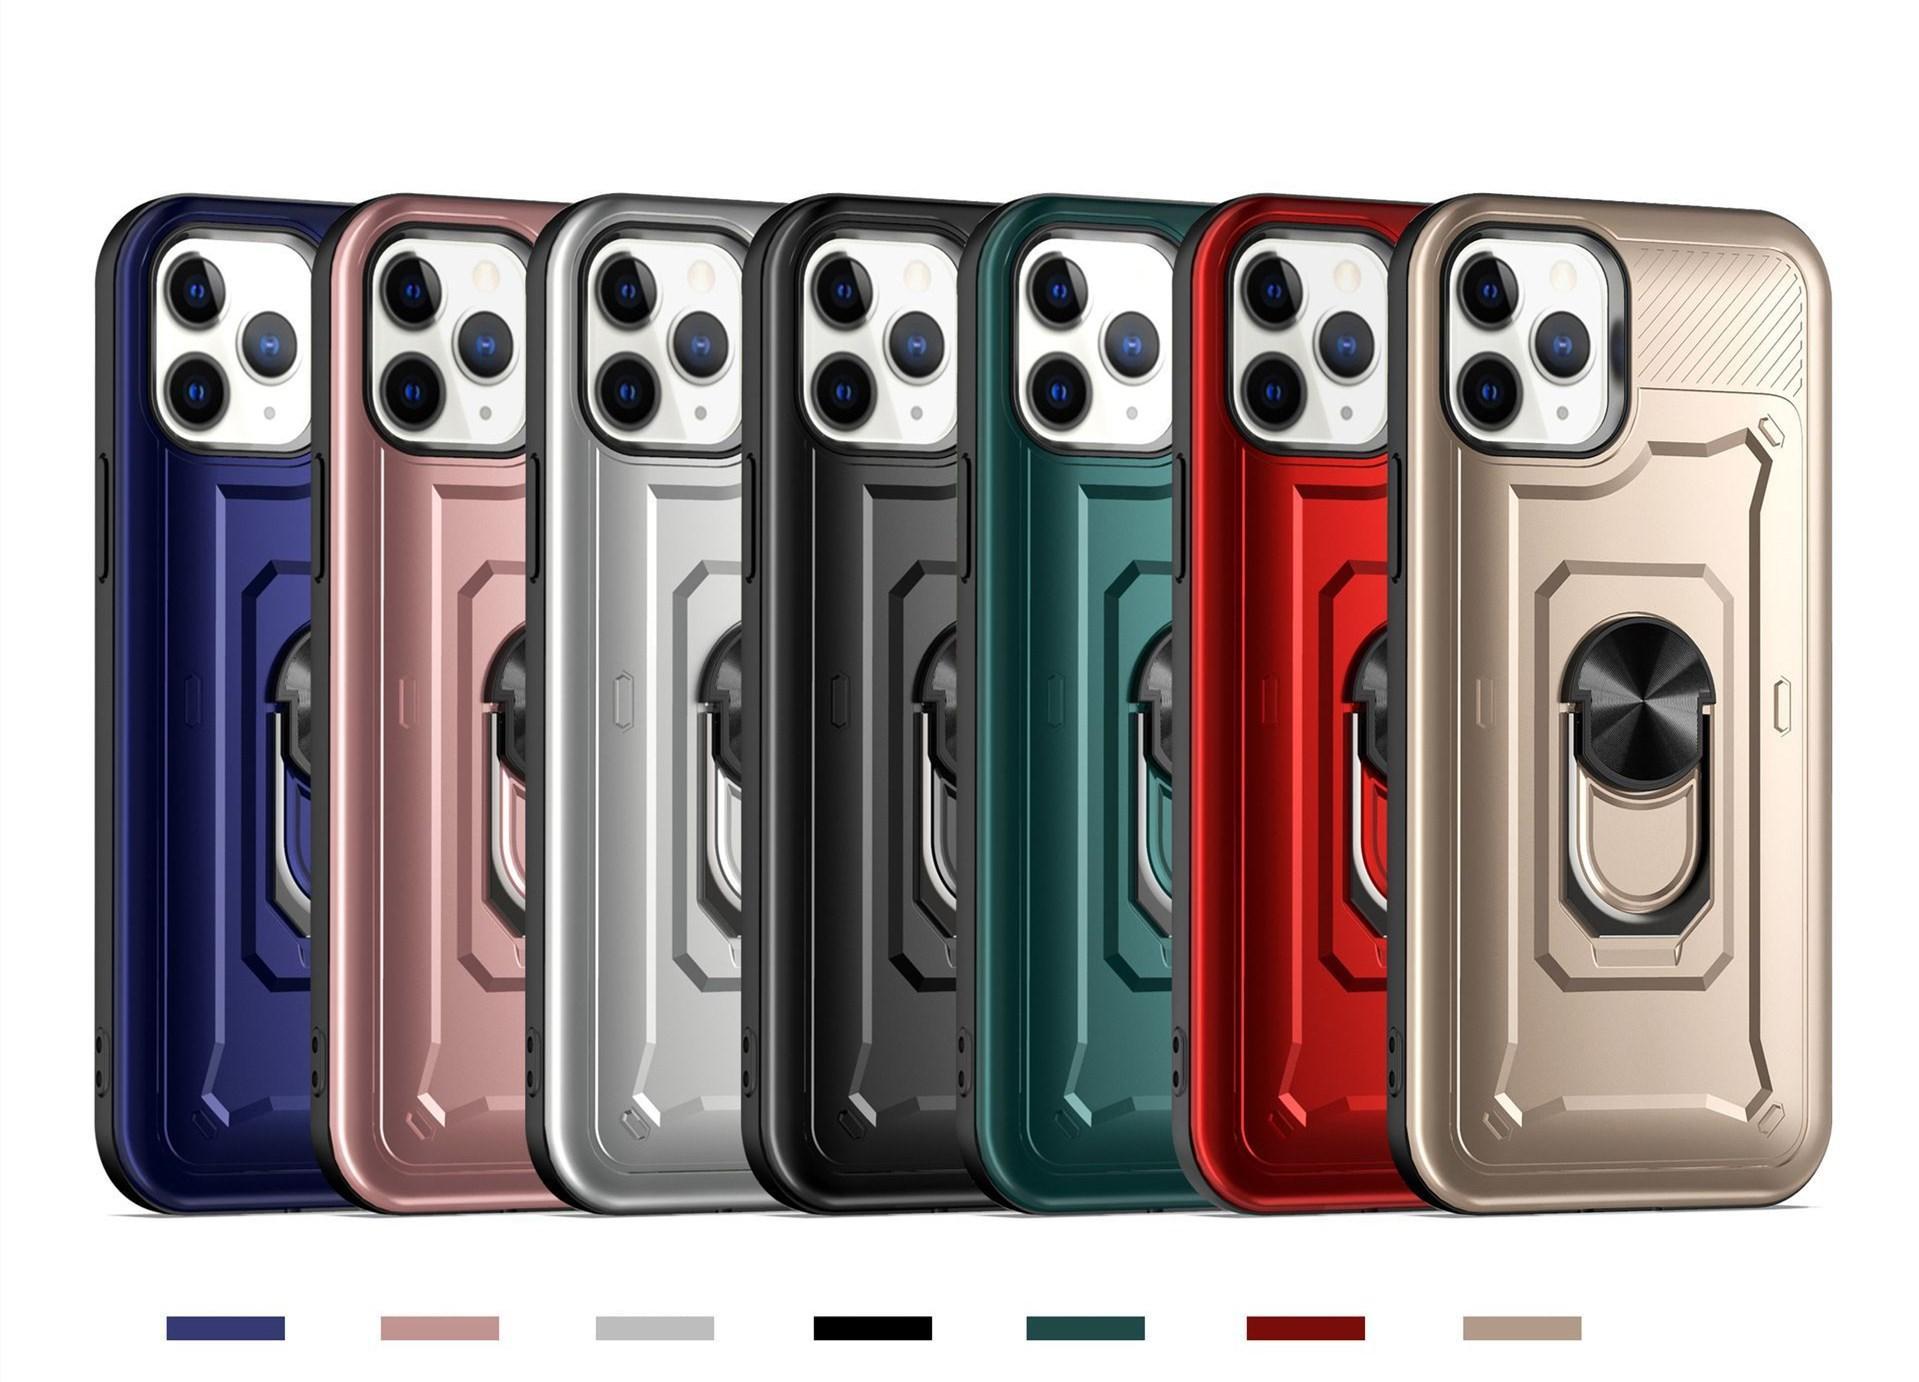 2 в 1 Armor Case для iPhone 12 Mini Pro Max XR XS 6 7 8 плюс 11 Samsung Note20 TPU Case PC Жесткая задняя крышка